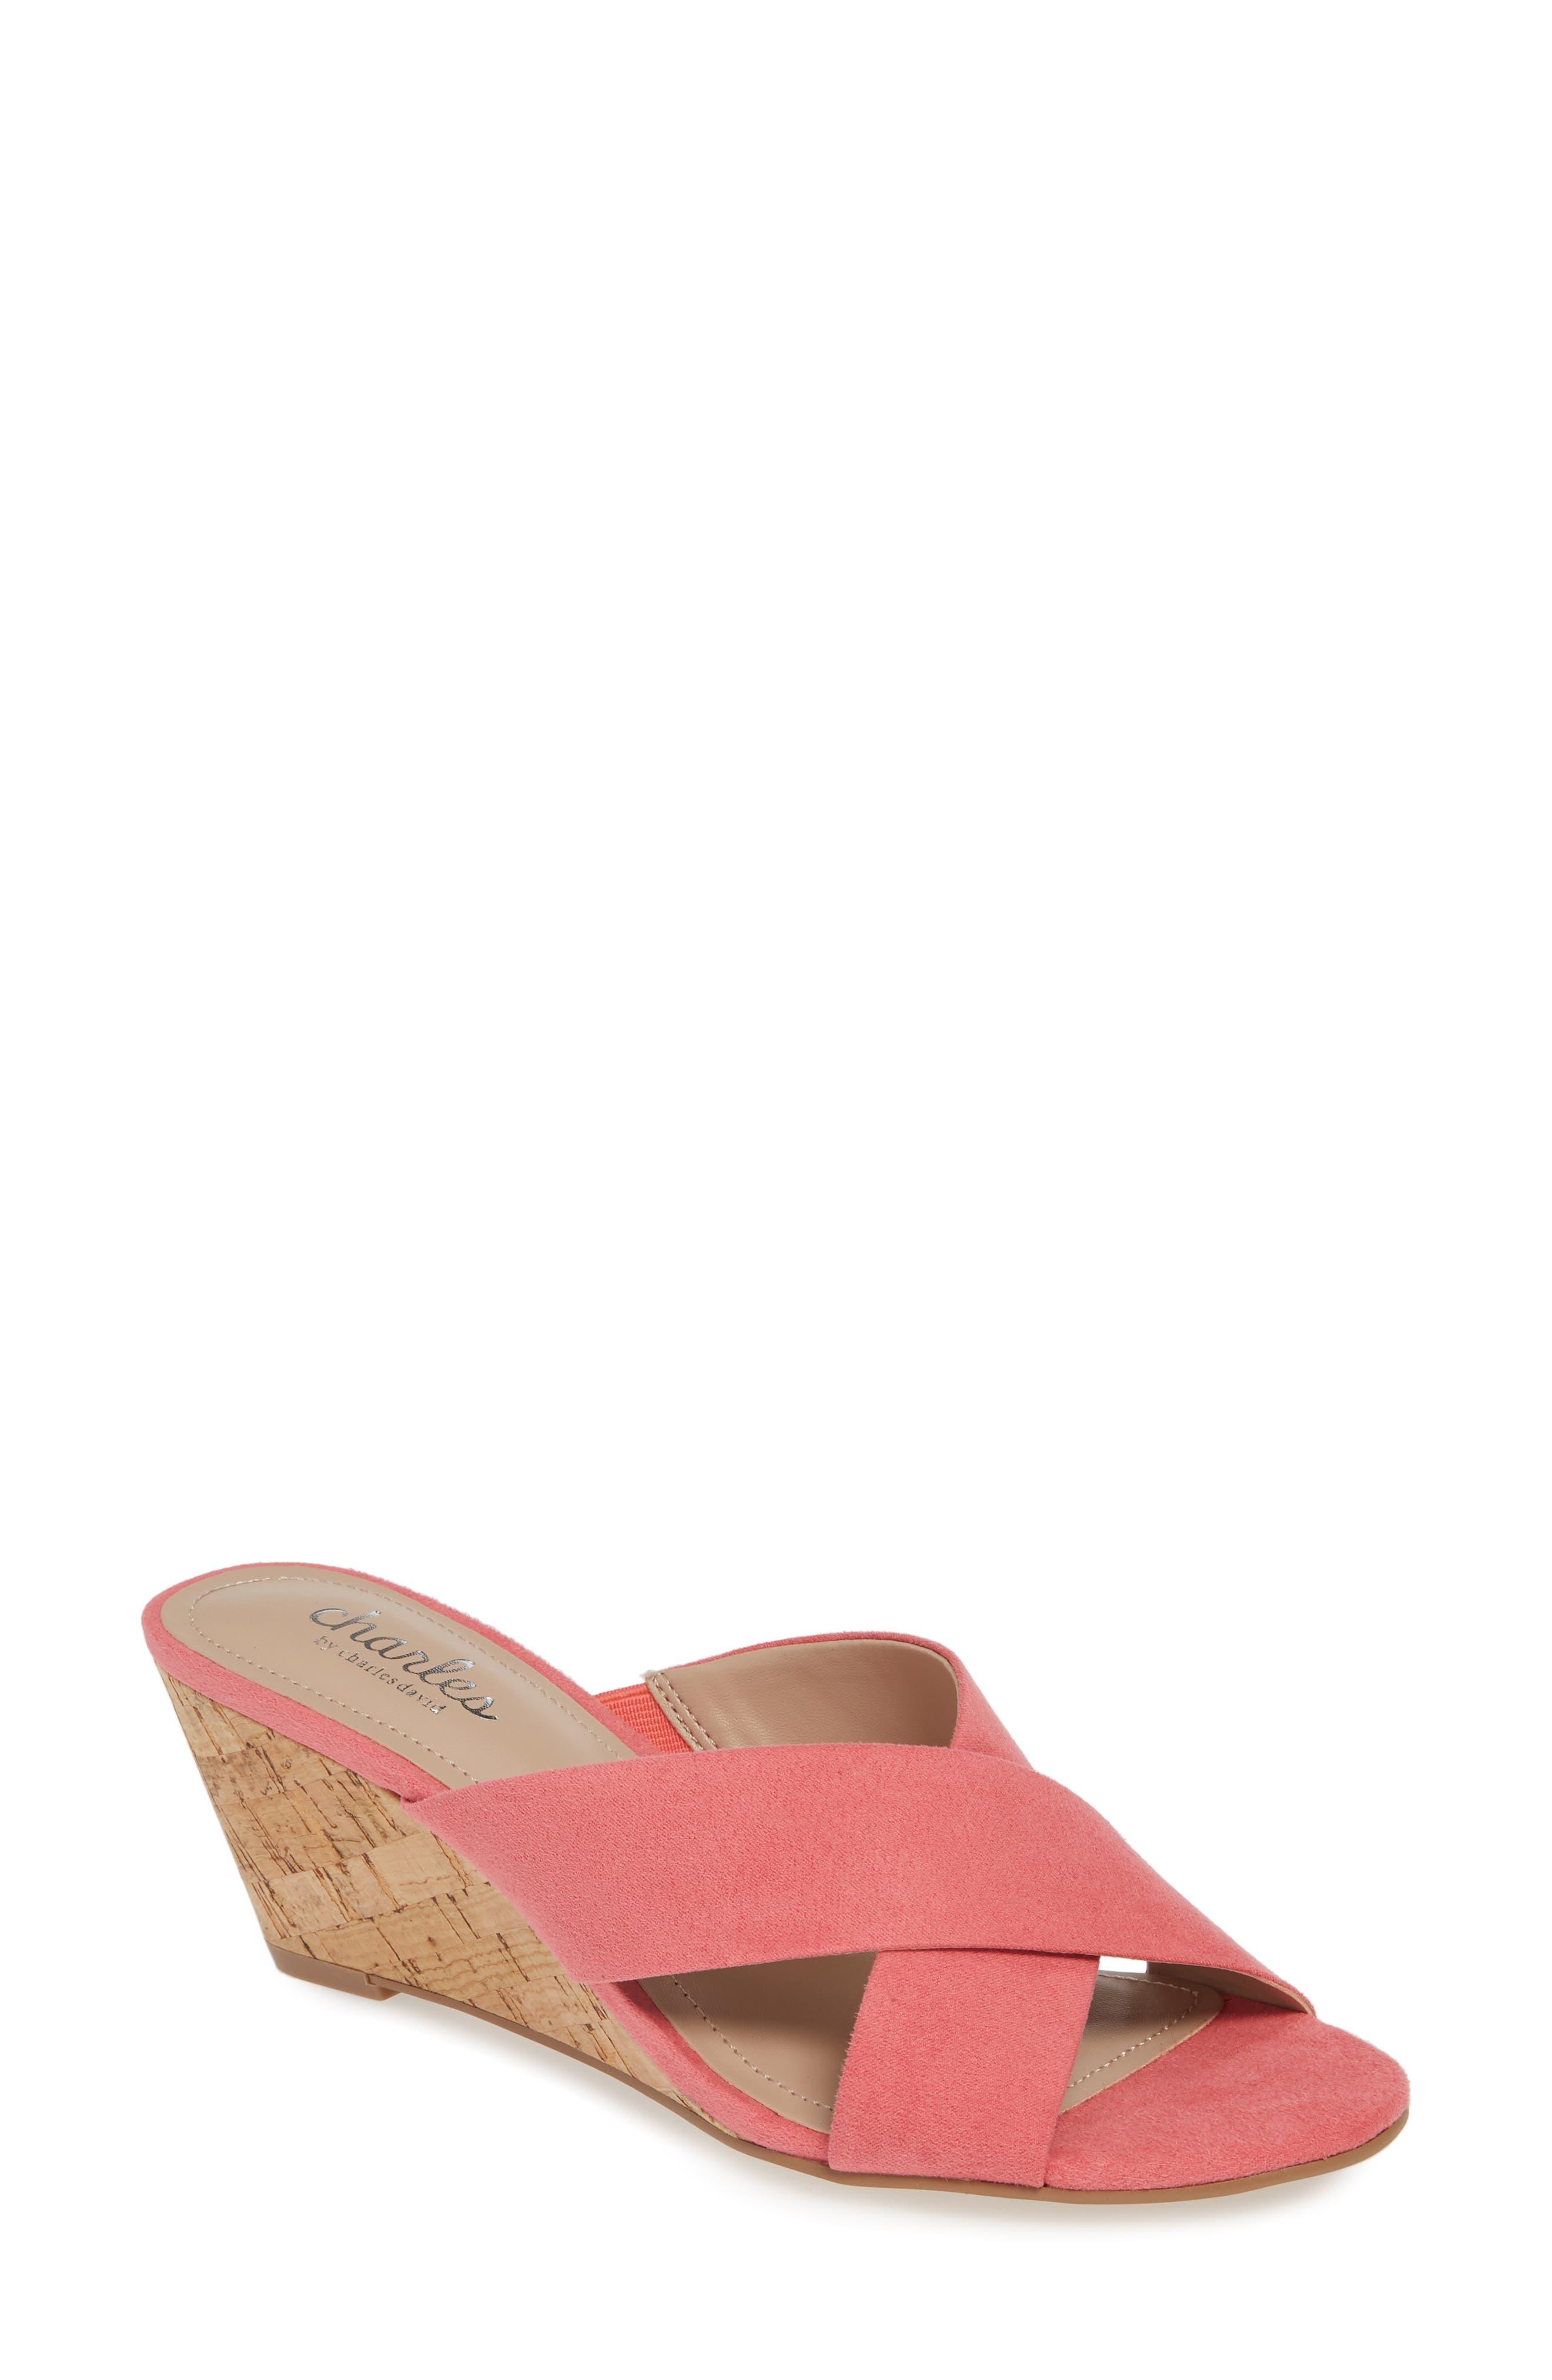 Charles By Charles David Grady Slide Sandal, Coral